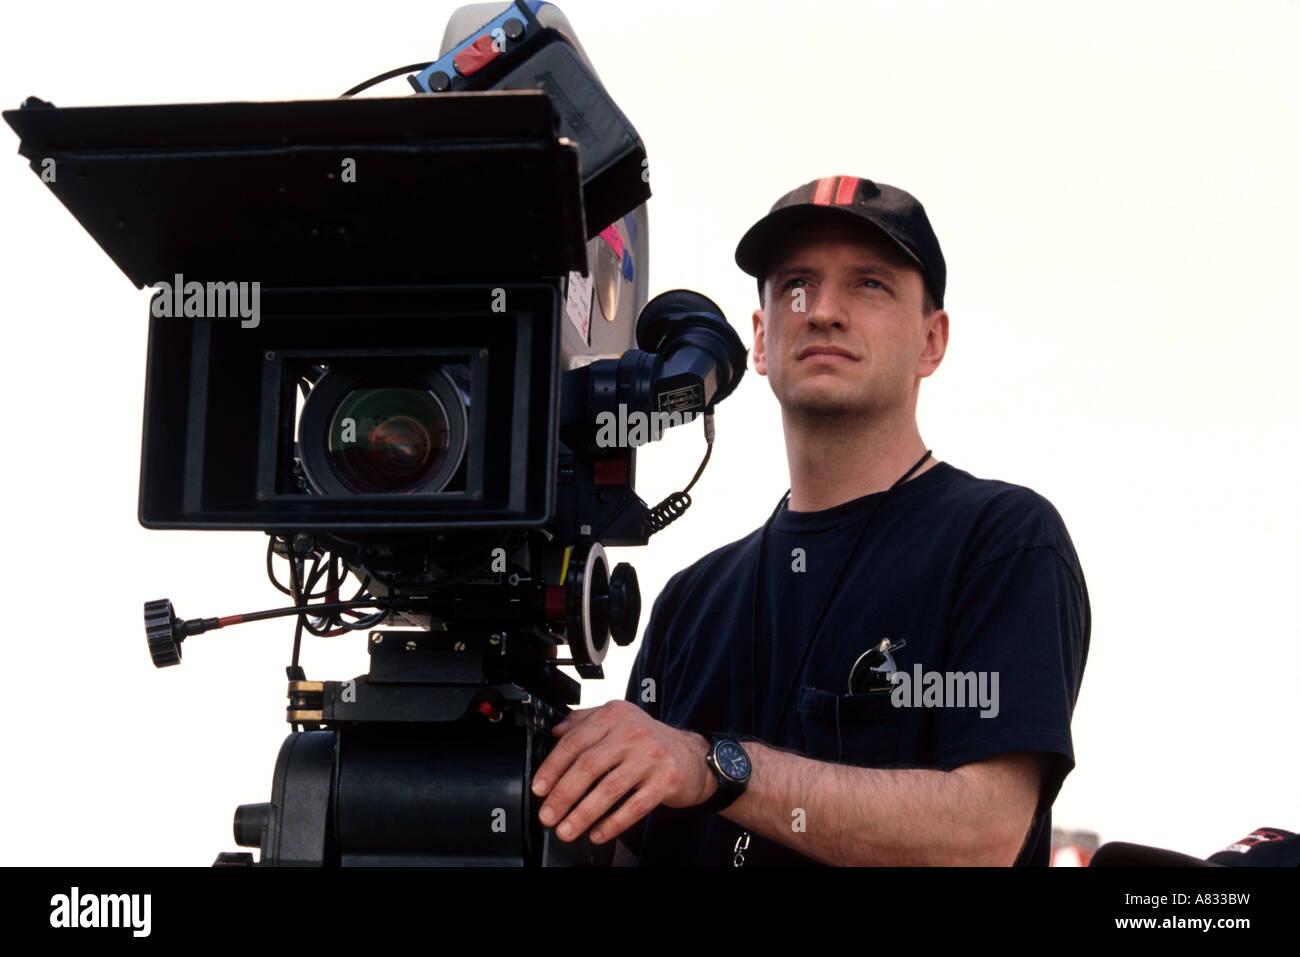 STEVEN SODERBERGH -  US film director on set of Warner's Oceans 11 in 2001 - Stock Image